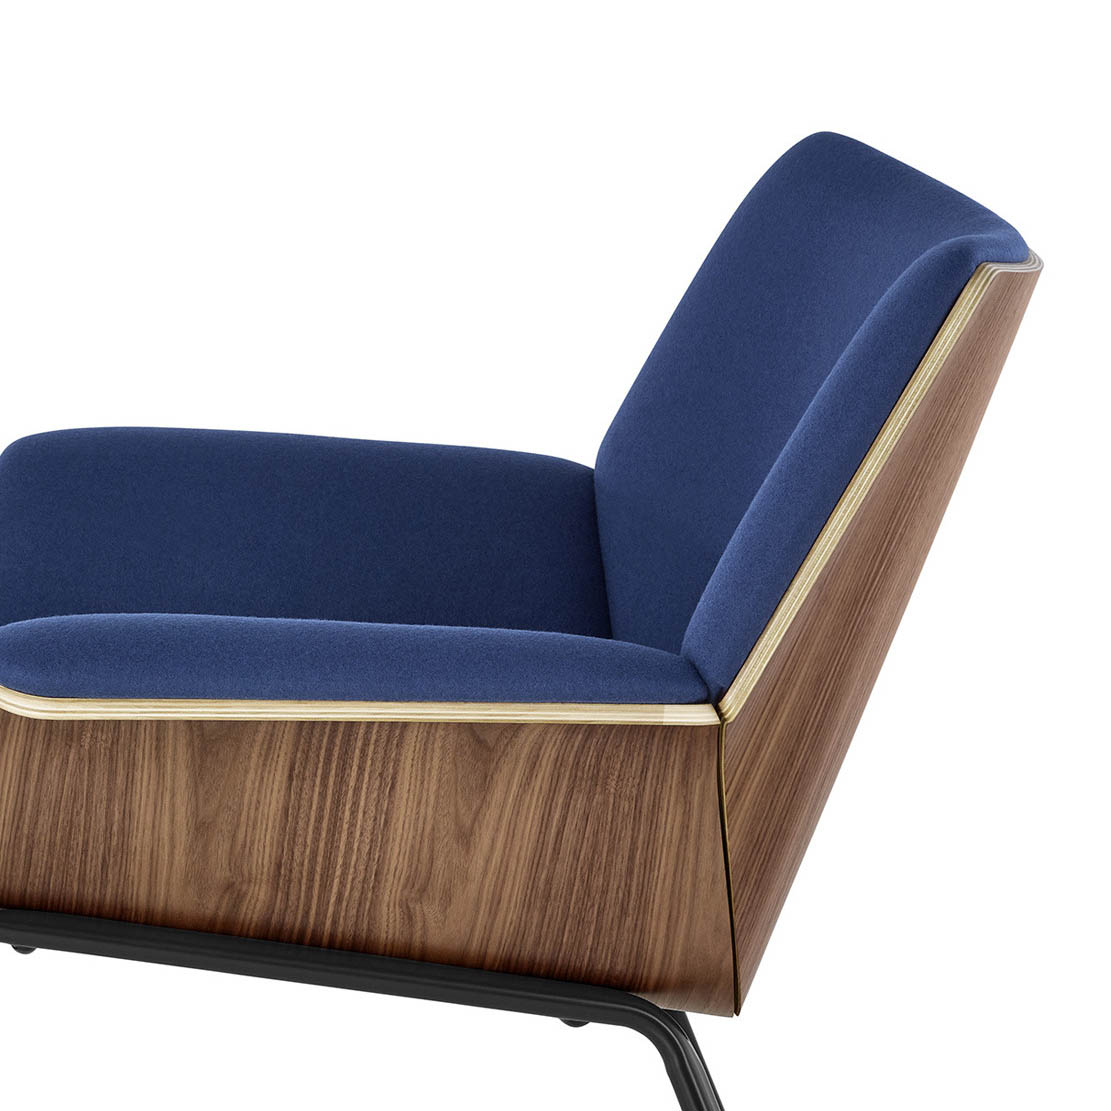 6-Silla-Lounge-Swoop-Respaldo-REF-1920